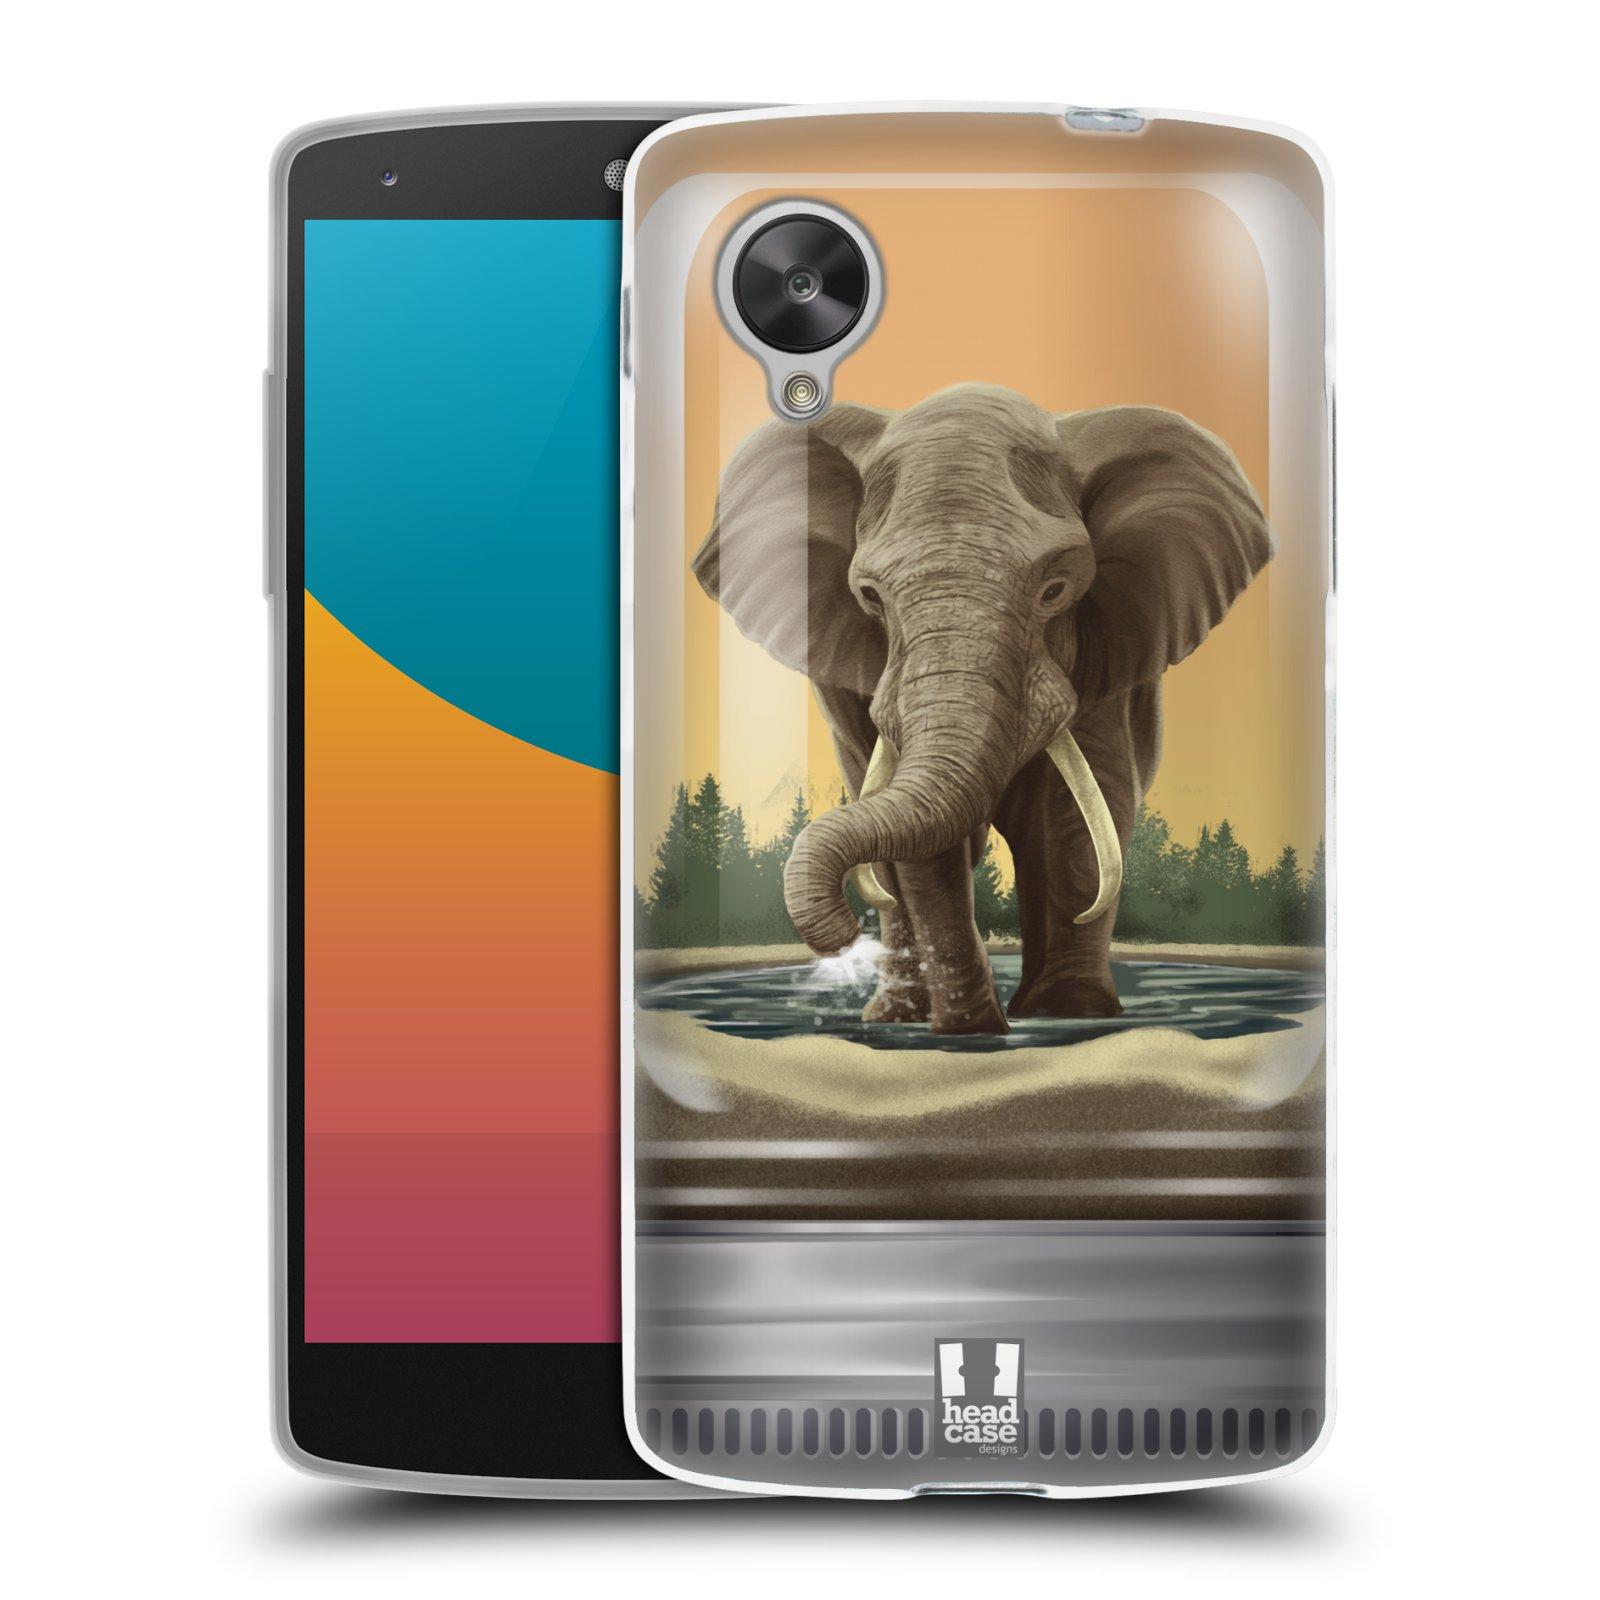 HEAD CASE silikonový obal na mobil LG NEXUS 5 (D821) vzor Zvířátka v těžítku slon